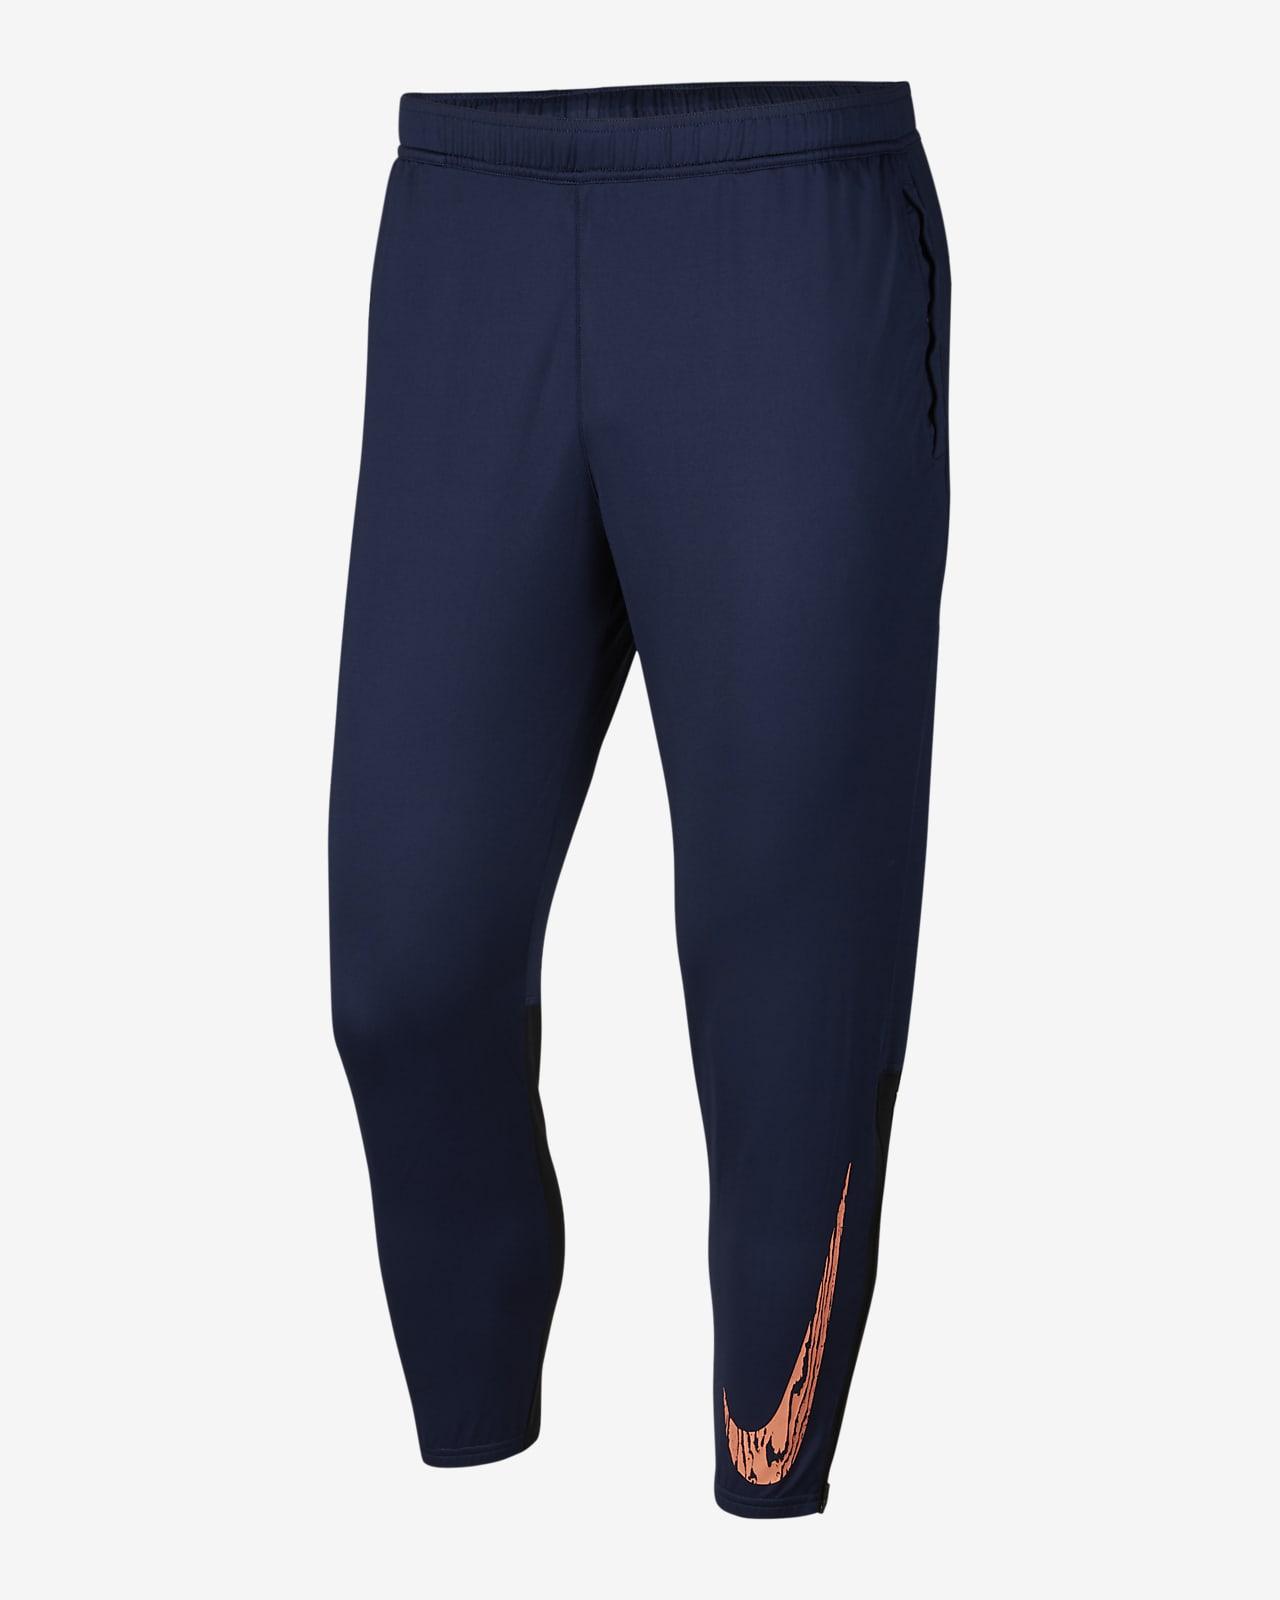 Nike Essential Wild Run 男子针织跑步长裤